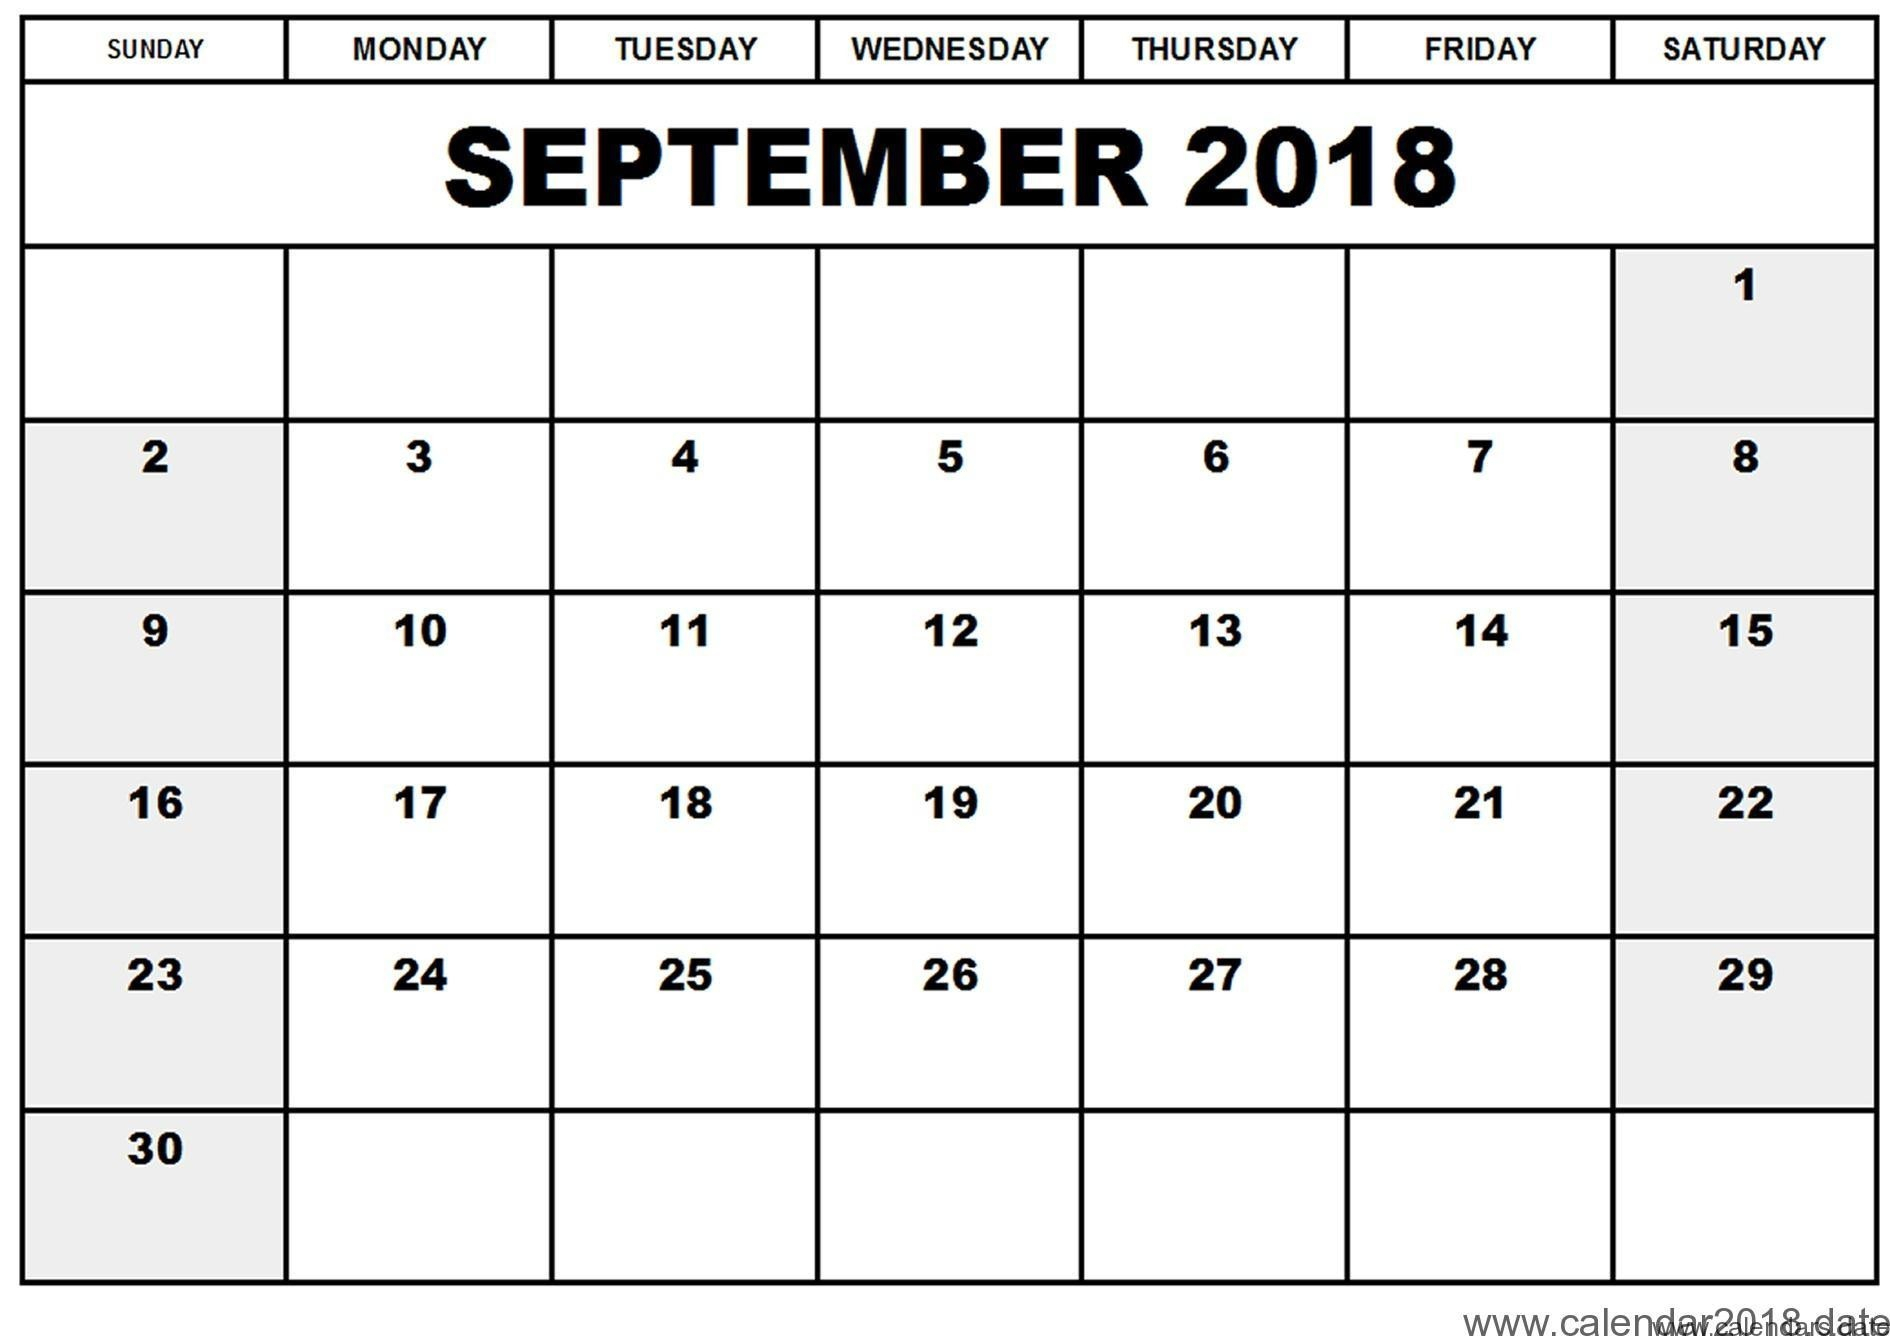 September Calendar 2018 Printable throughout Blank Printable September Calendar Template